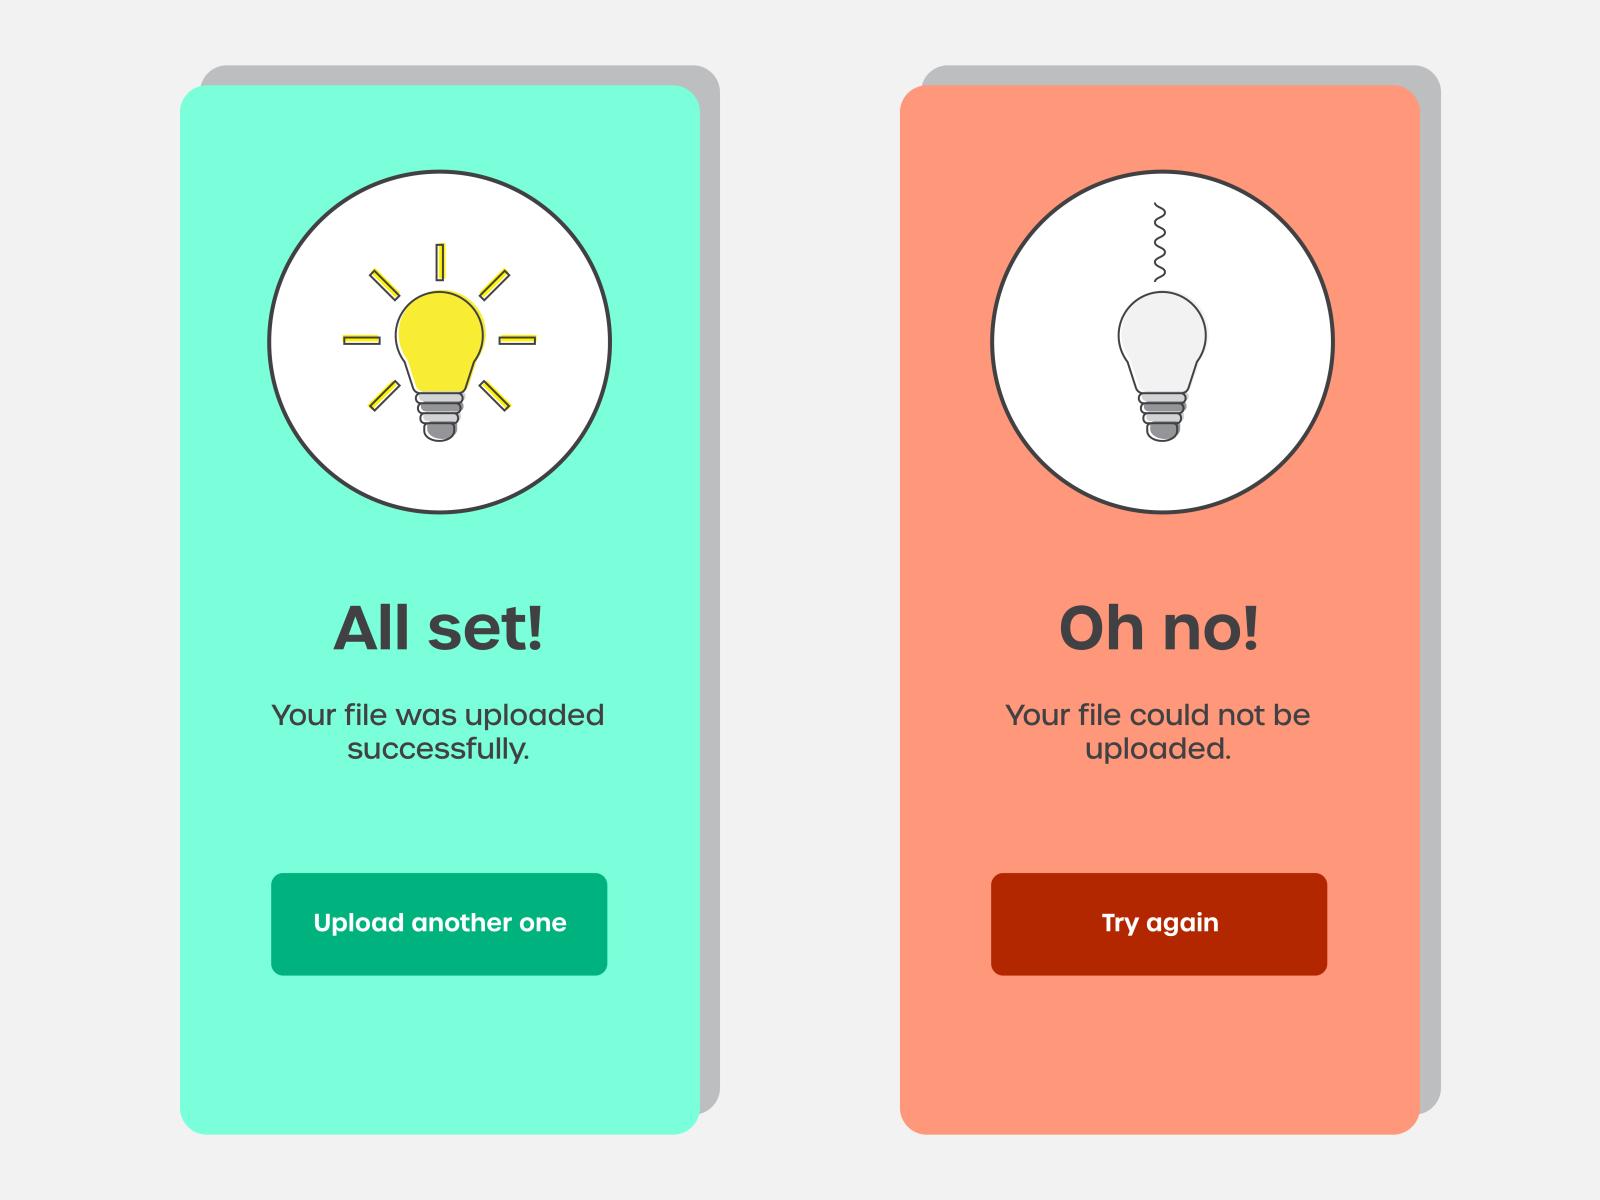 Design challenge - Alert messages